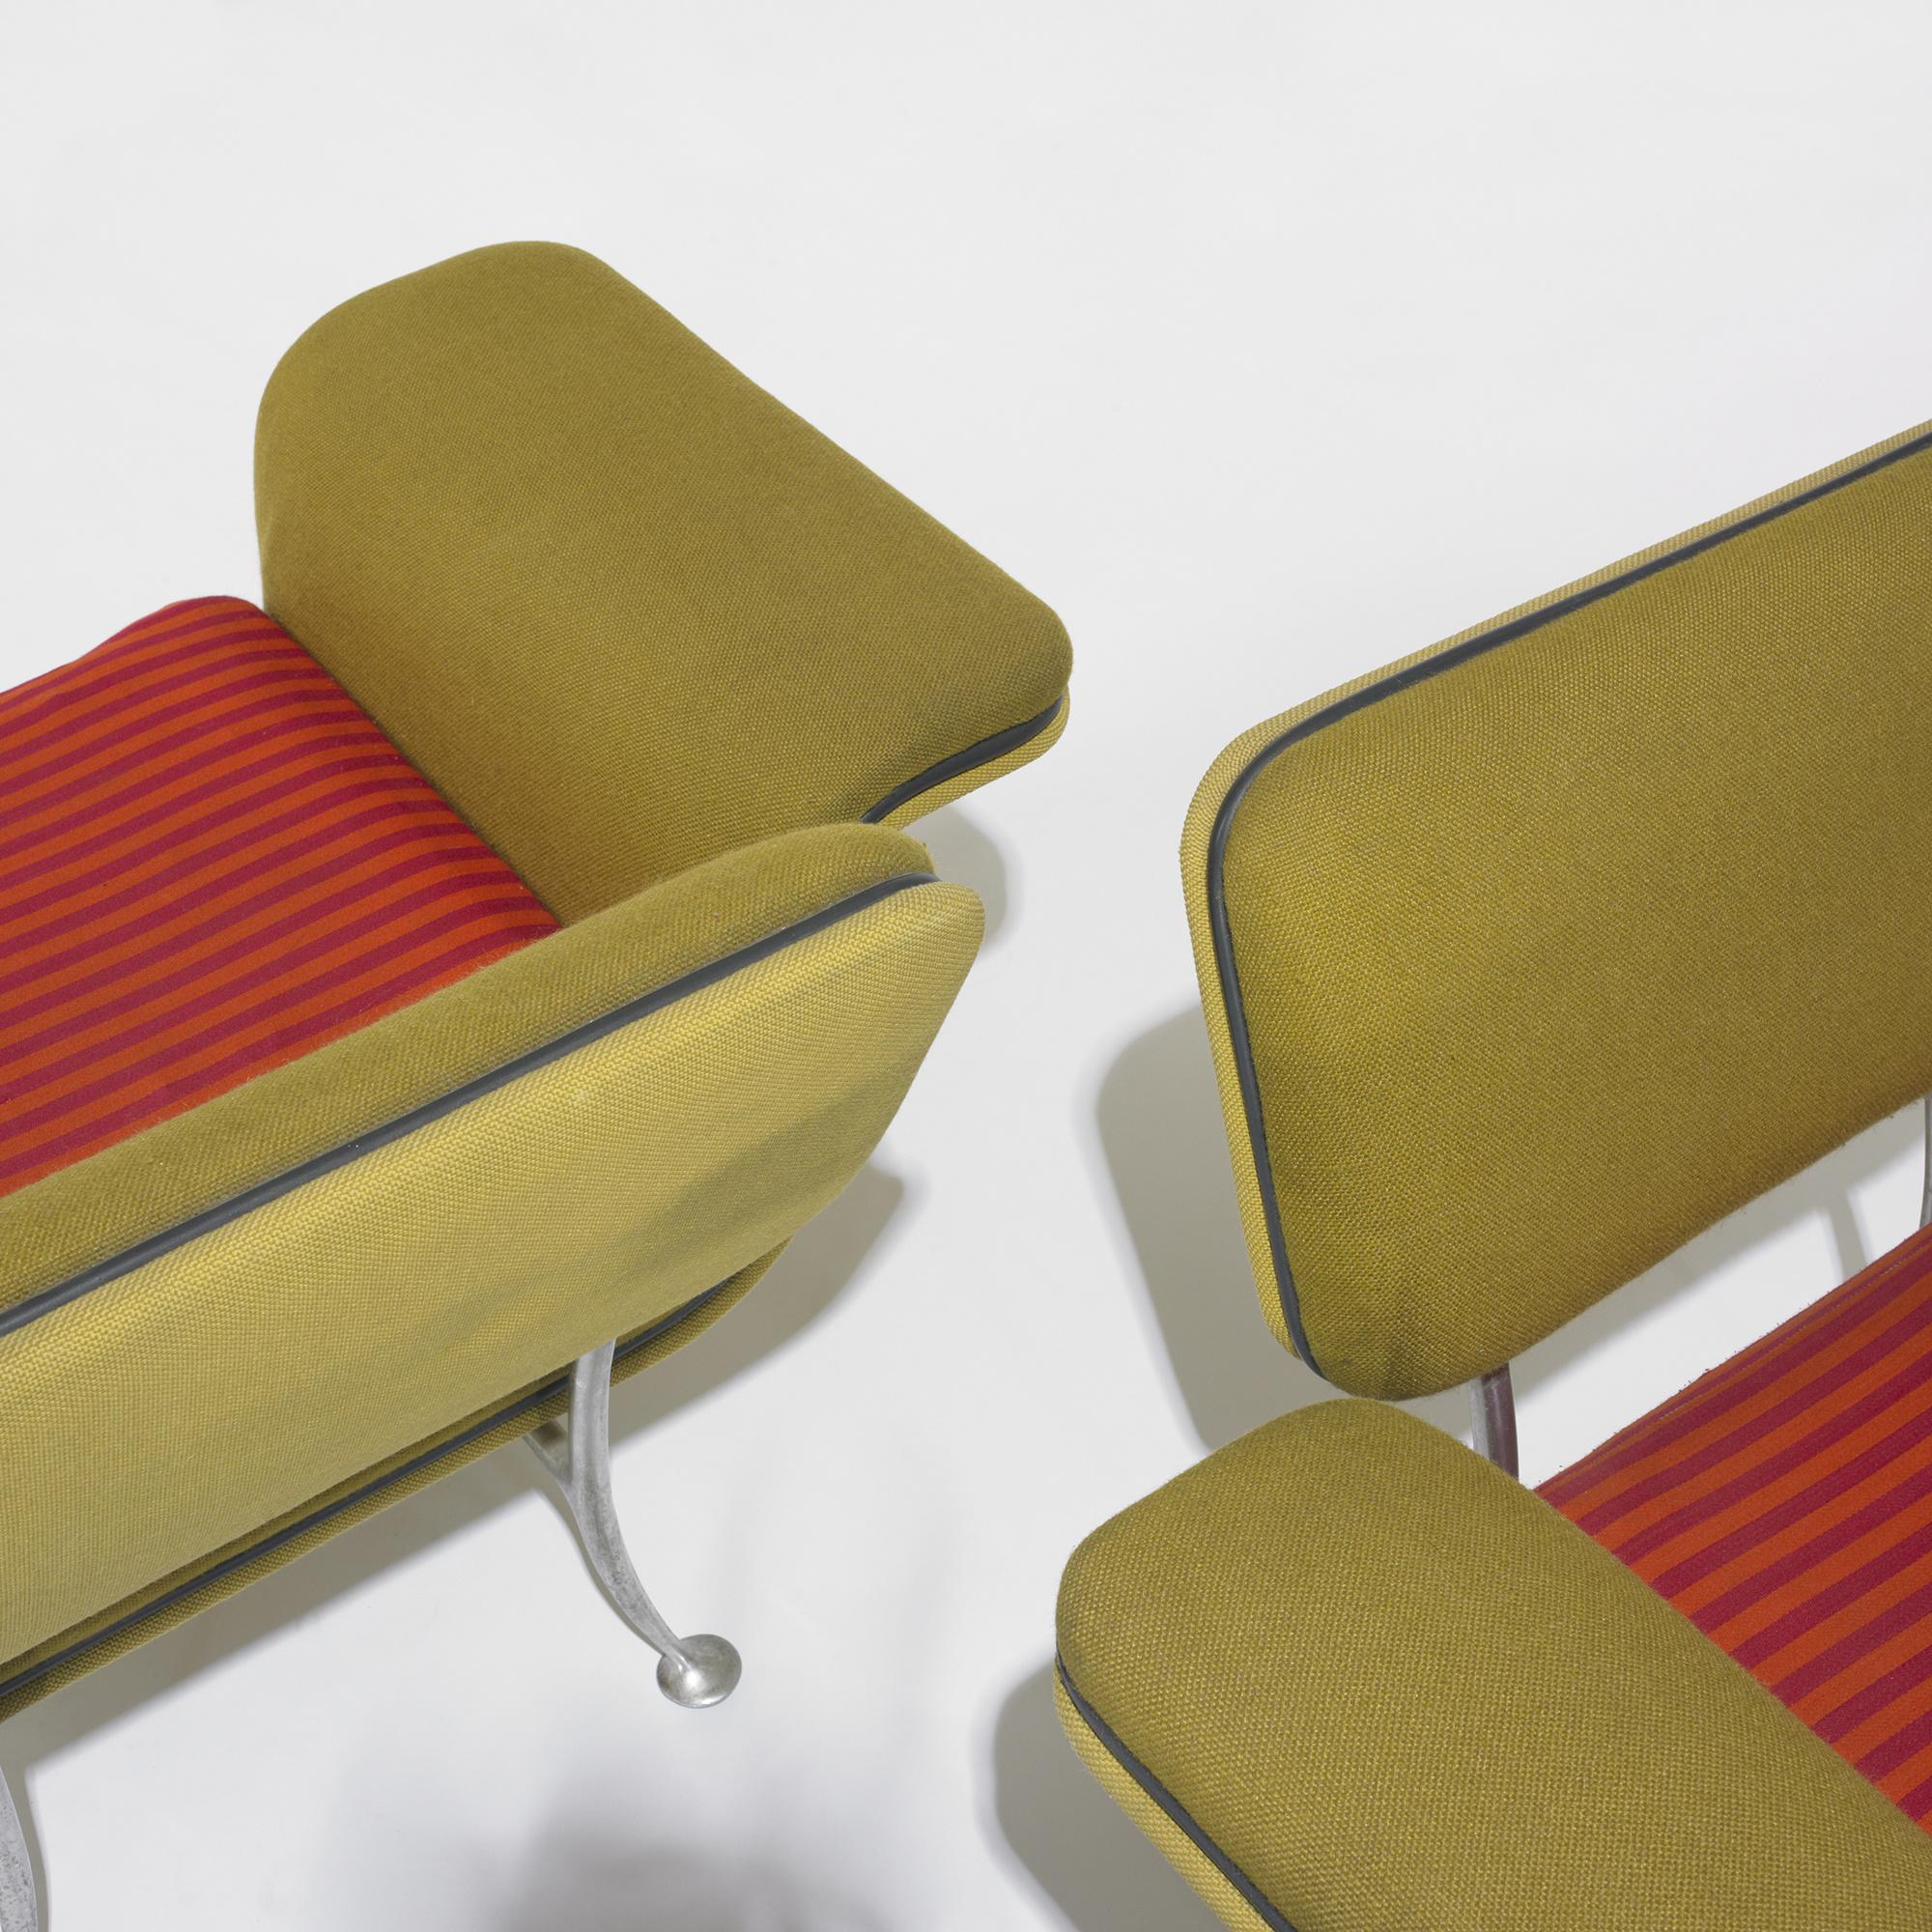 Modern Home Design October 2012: 429: ALEXANDER GIRARD, Lounge Chairs Model 66310, Pair